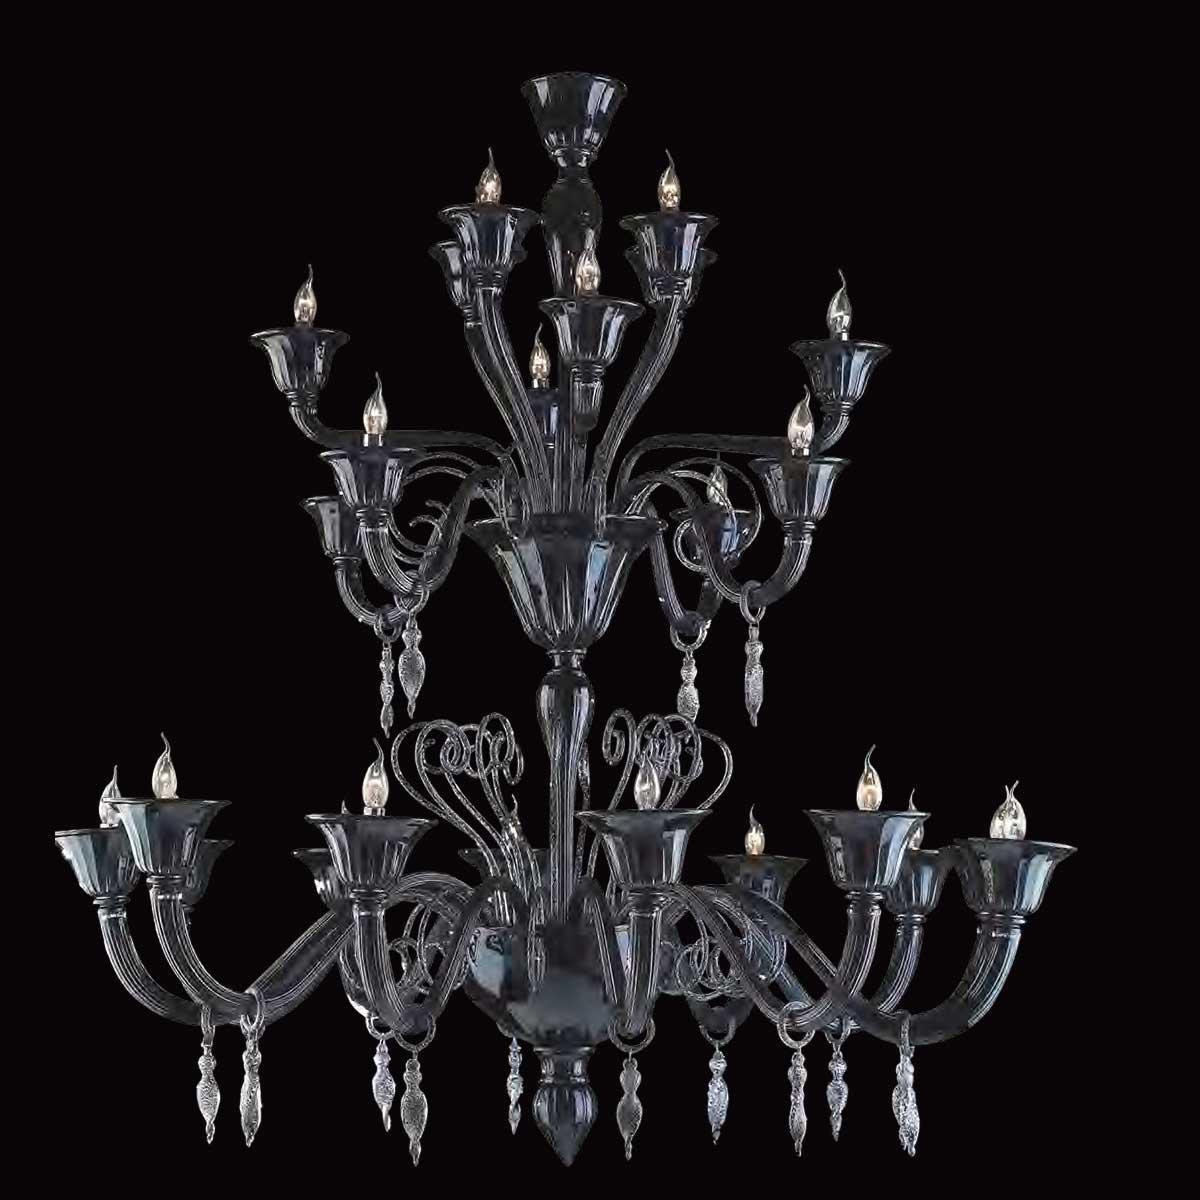 """Nito"" lampara de araña de Murano - 12+4+4+4 luces - negro y plata"